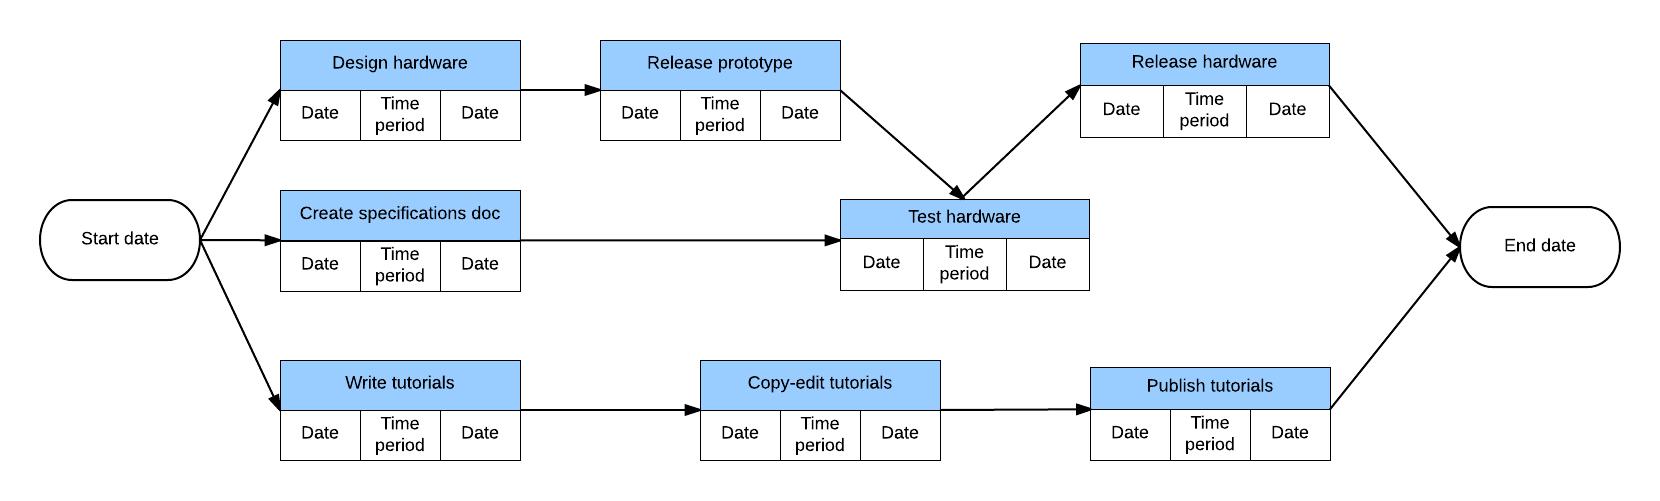 schedule network diagram project management single phase 2 speed motor wiring advantages of pert charts vs. gantt | lucidchart blog